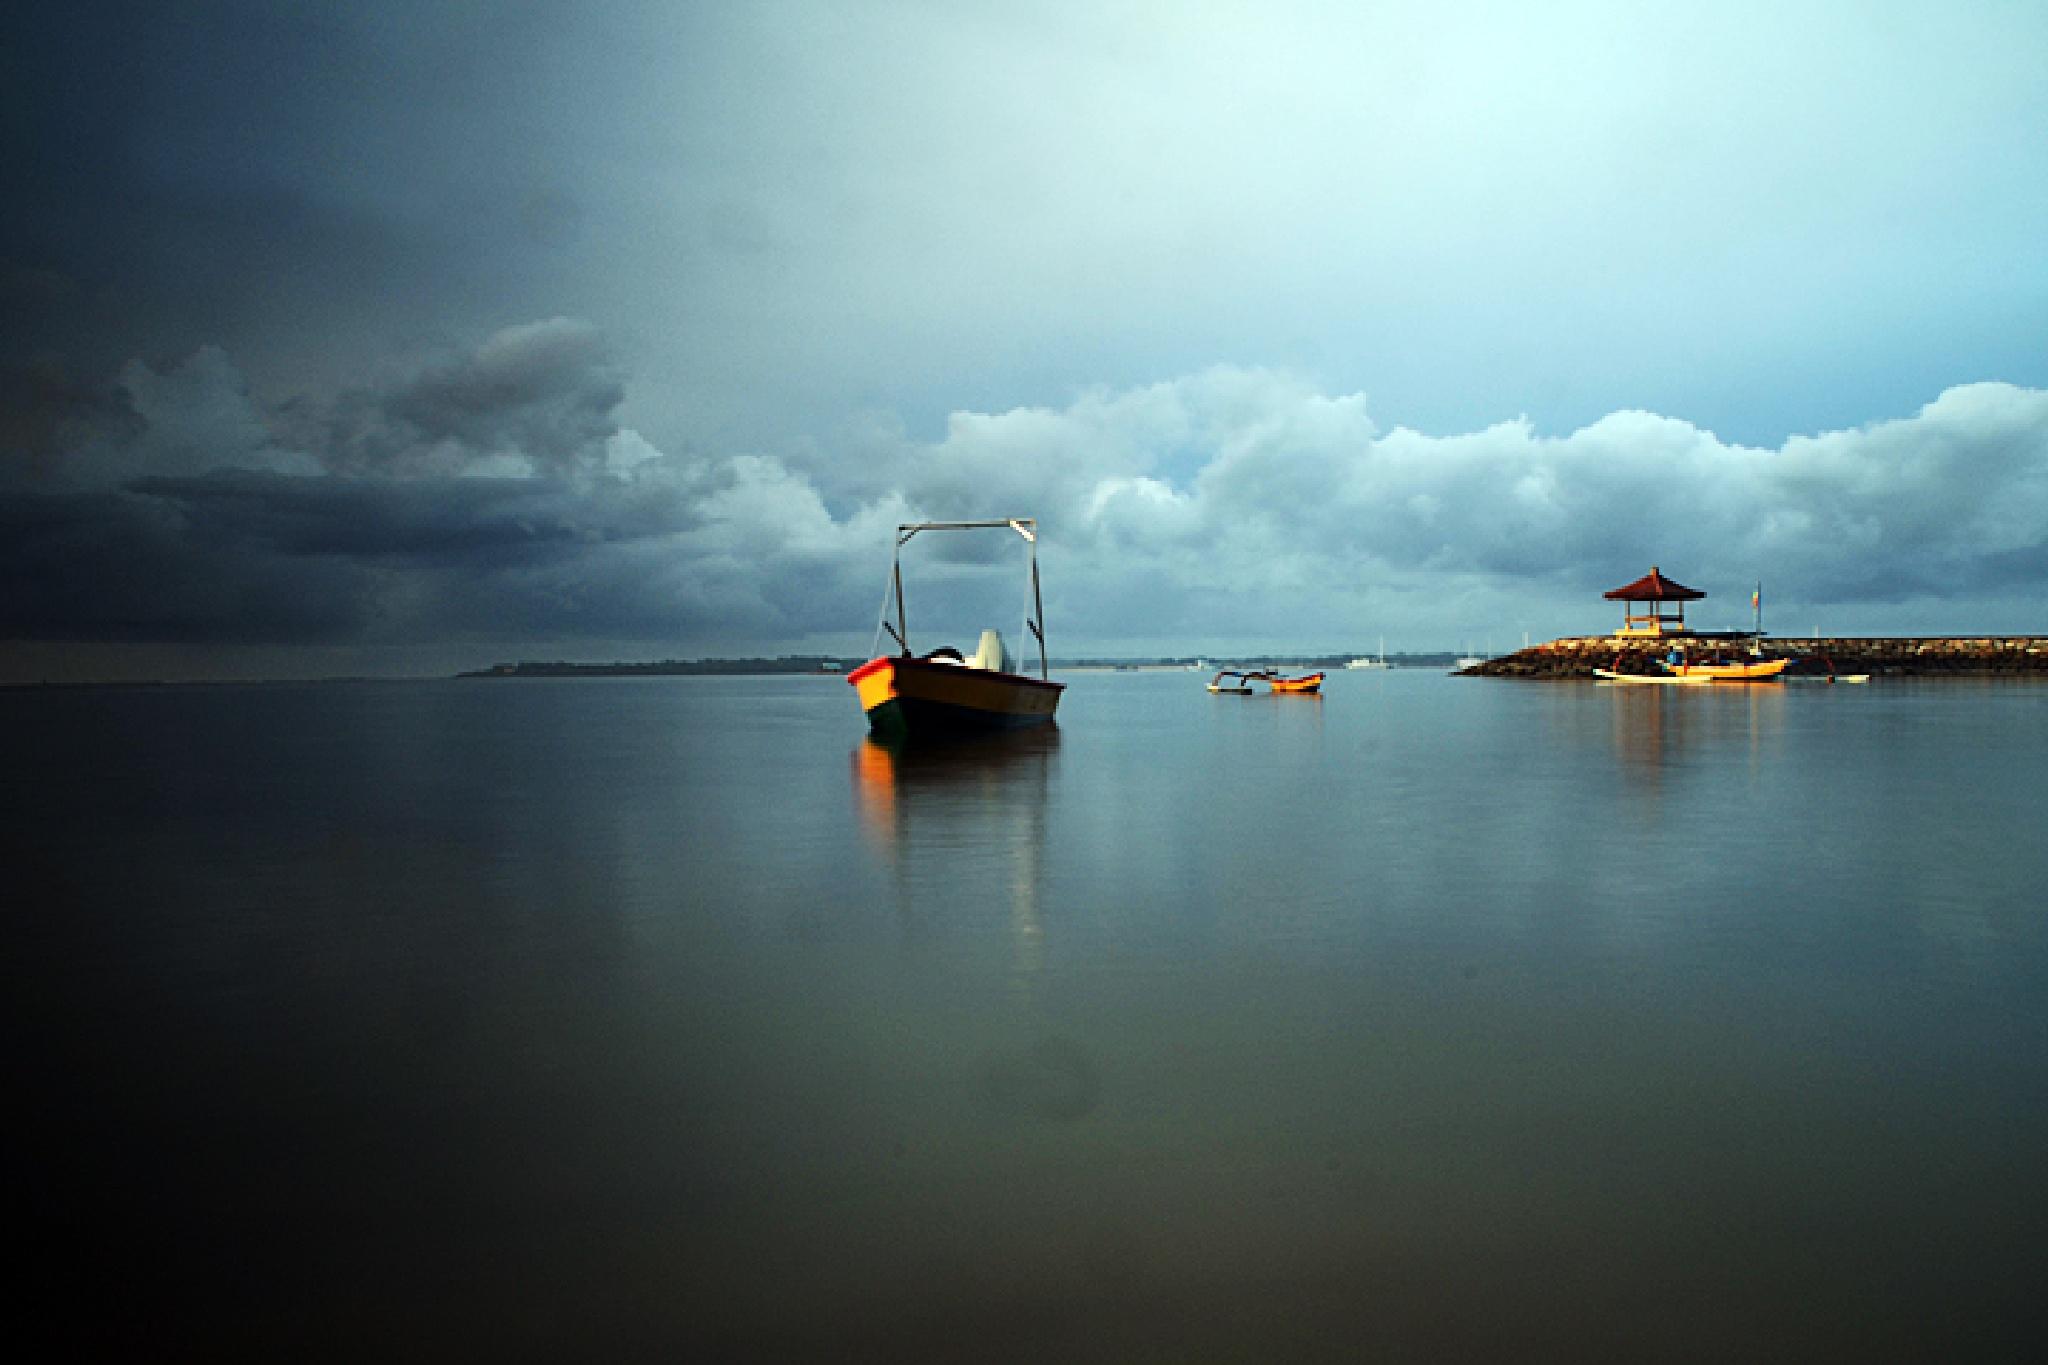 boat by dewaputra